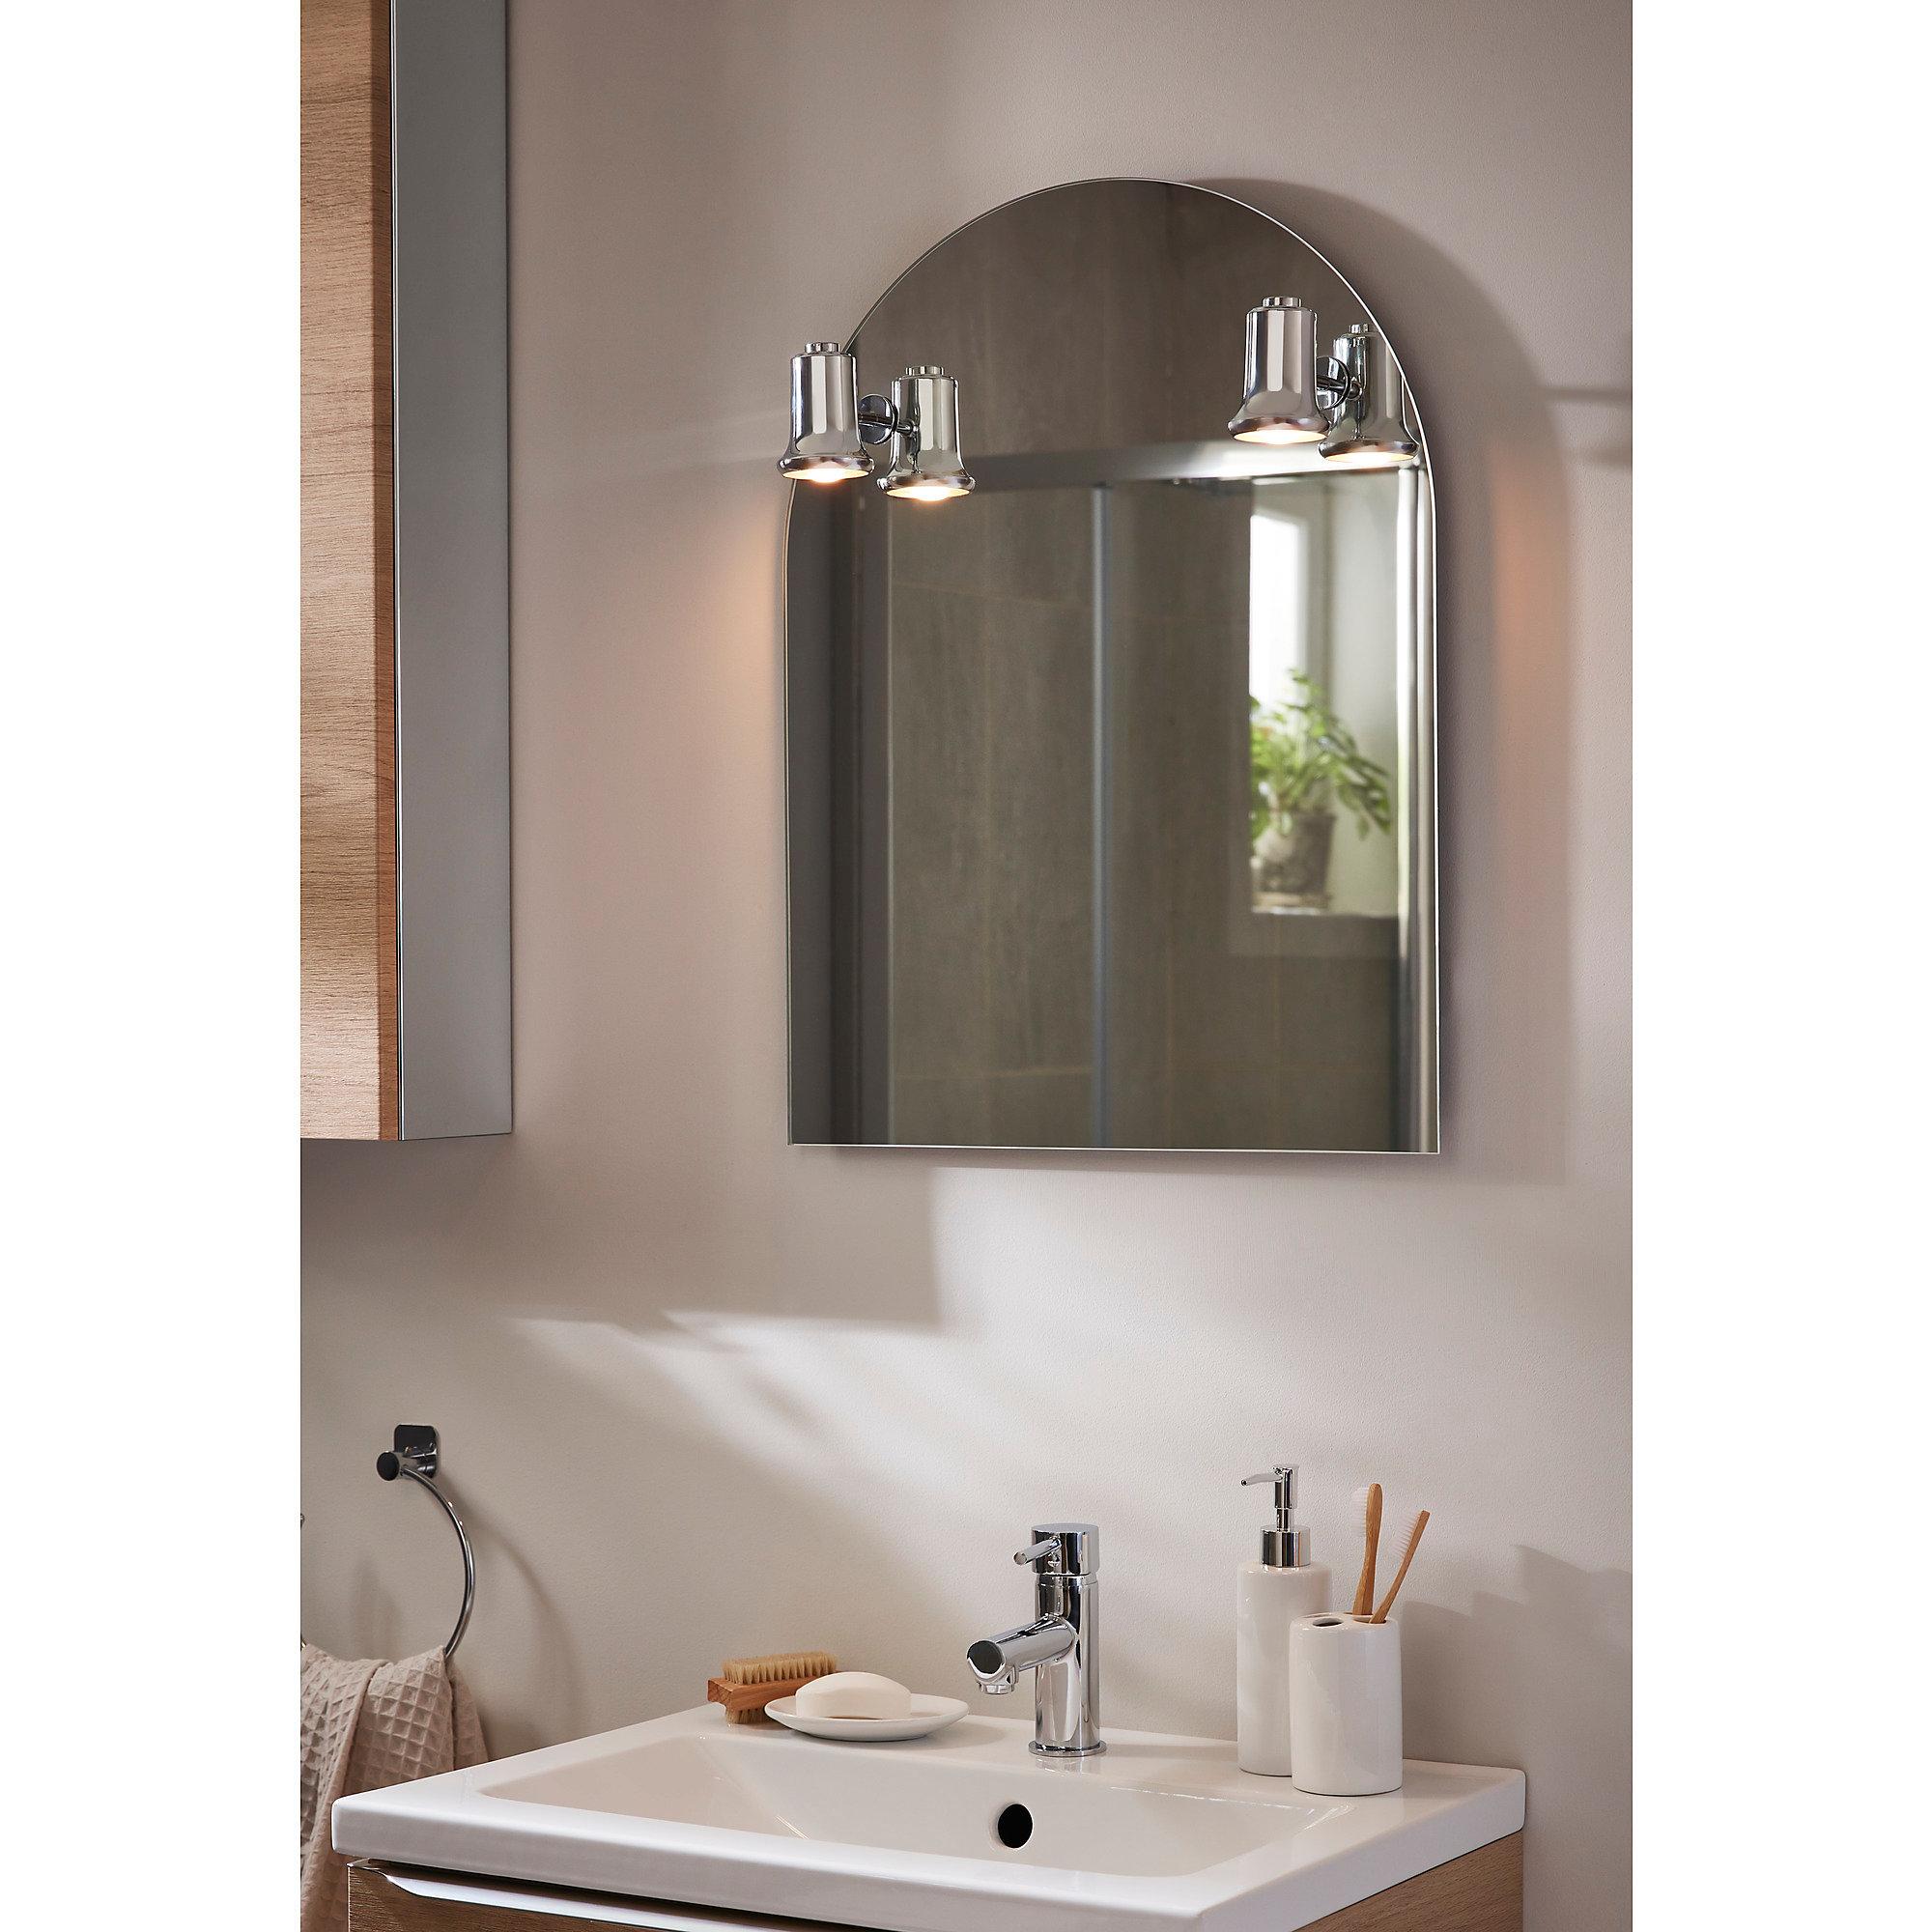 Design Miroir Salle De Bain Lumineux Castorama